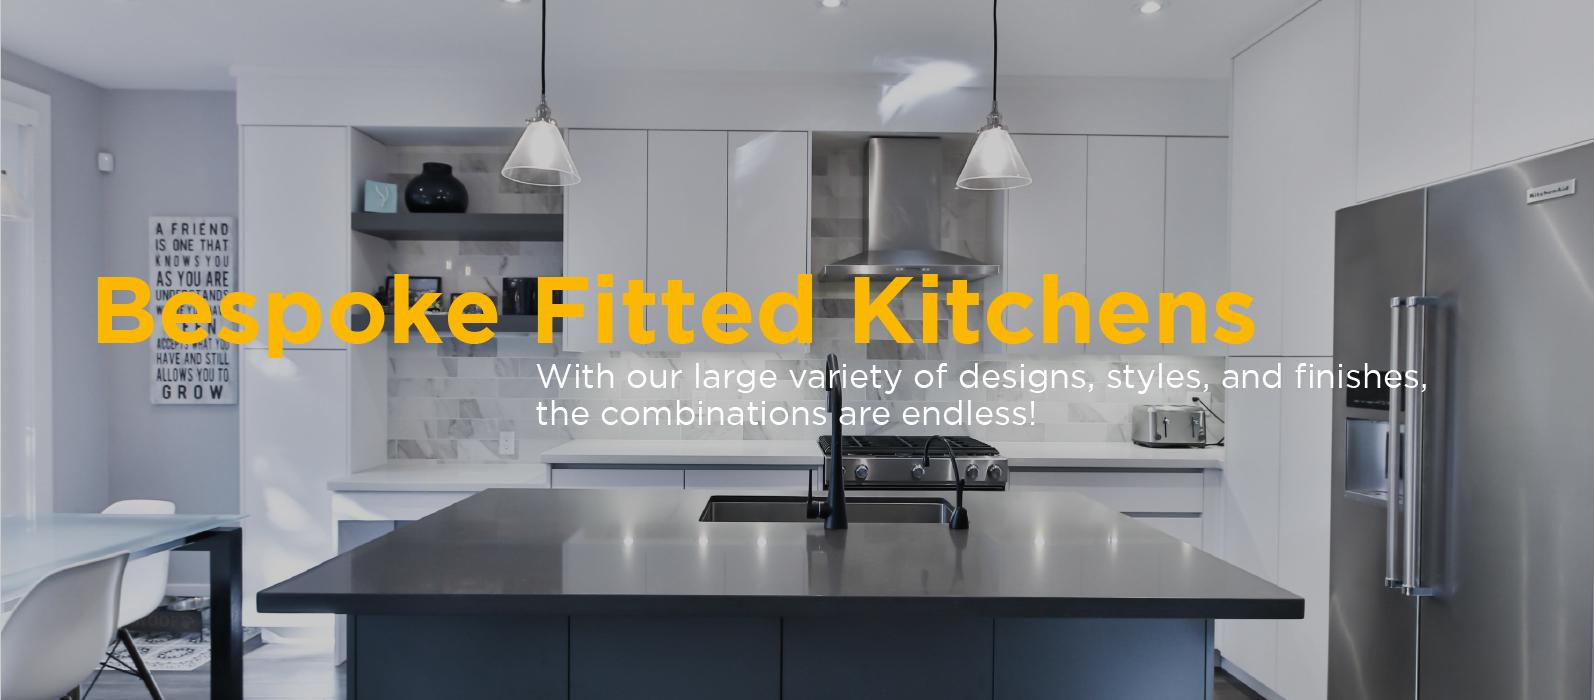 Reface Scotland specialists Replacement Kitchen Doors